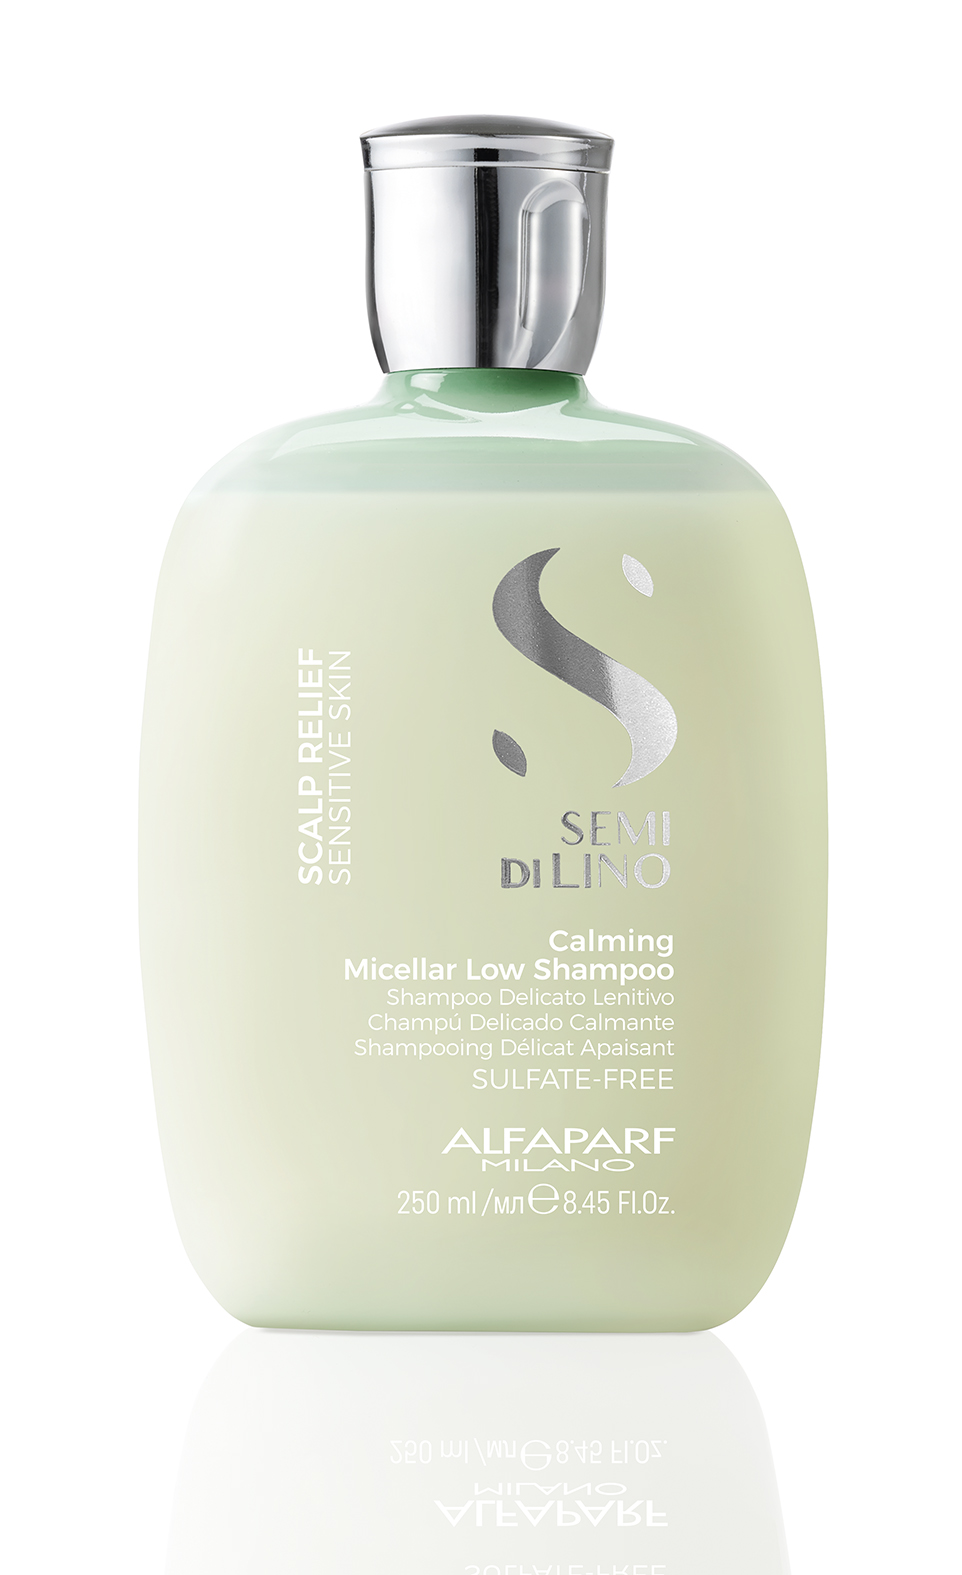 semi-di-lino-scalp-calming-micellar-low-shampoo-pf019477-fla-250ml-nolev